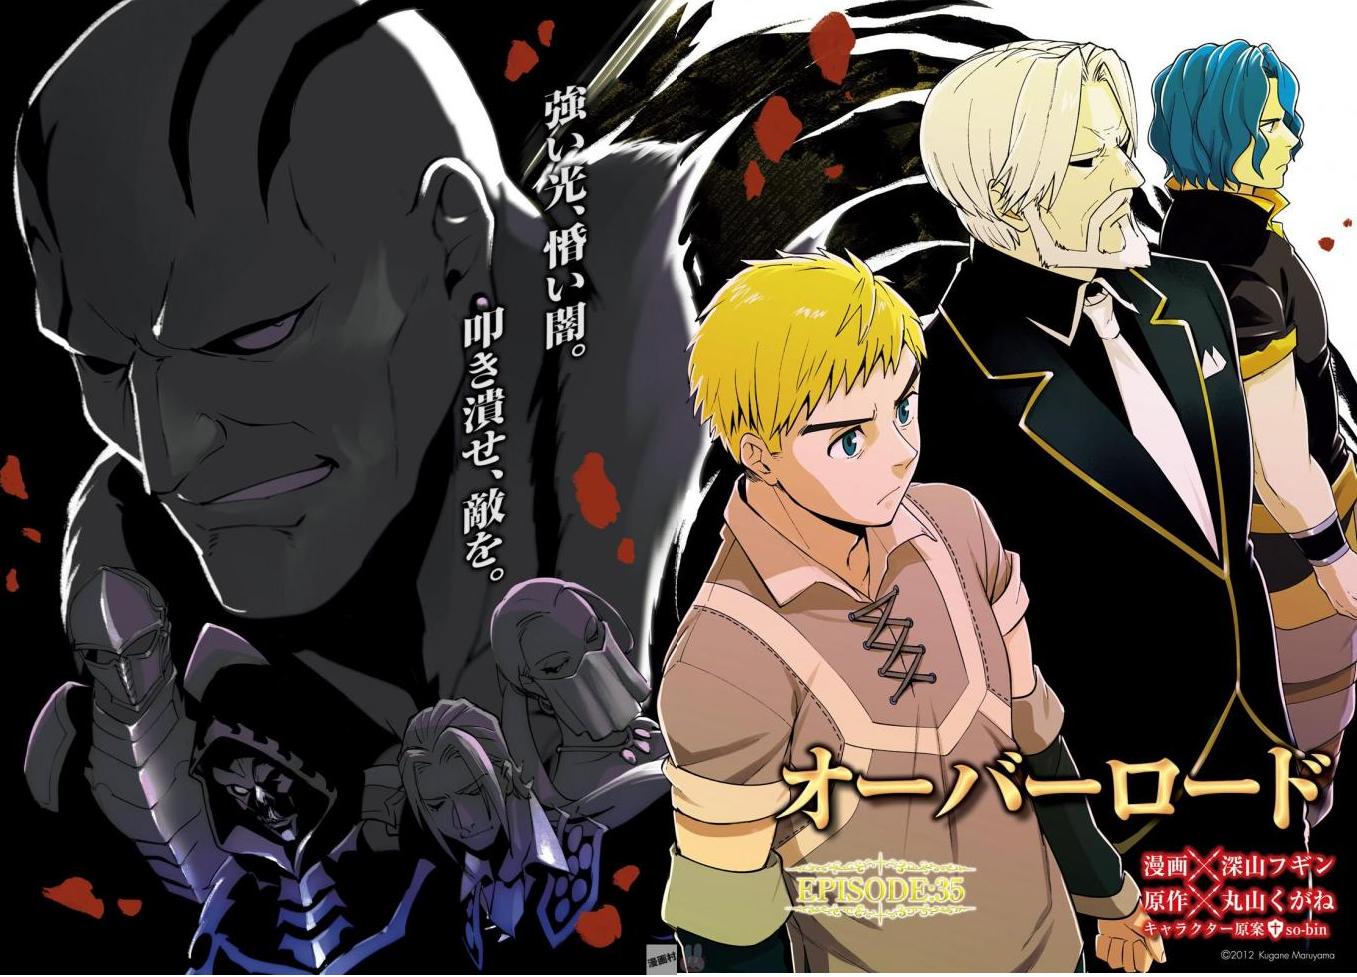 Overlord Manga Chapter 35 Overlord Wiki Fandom